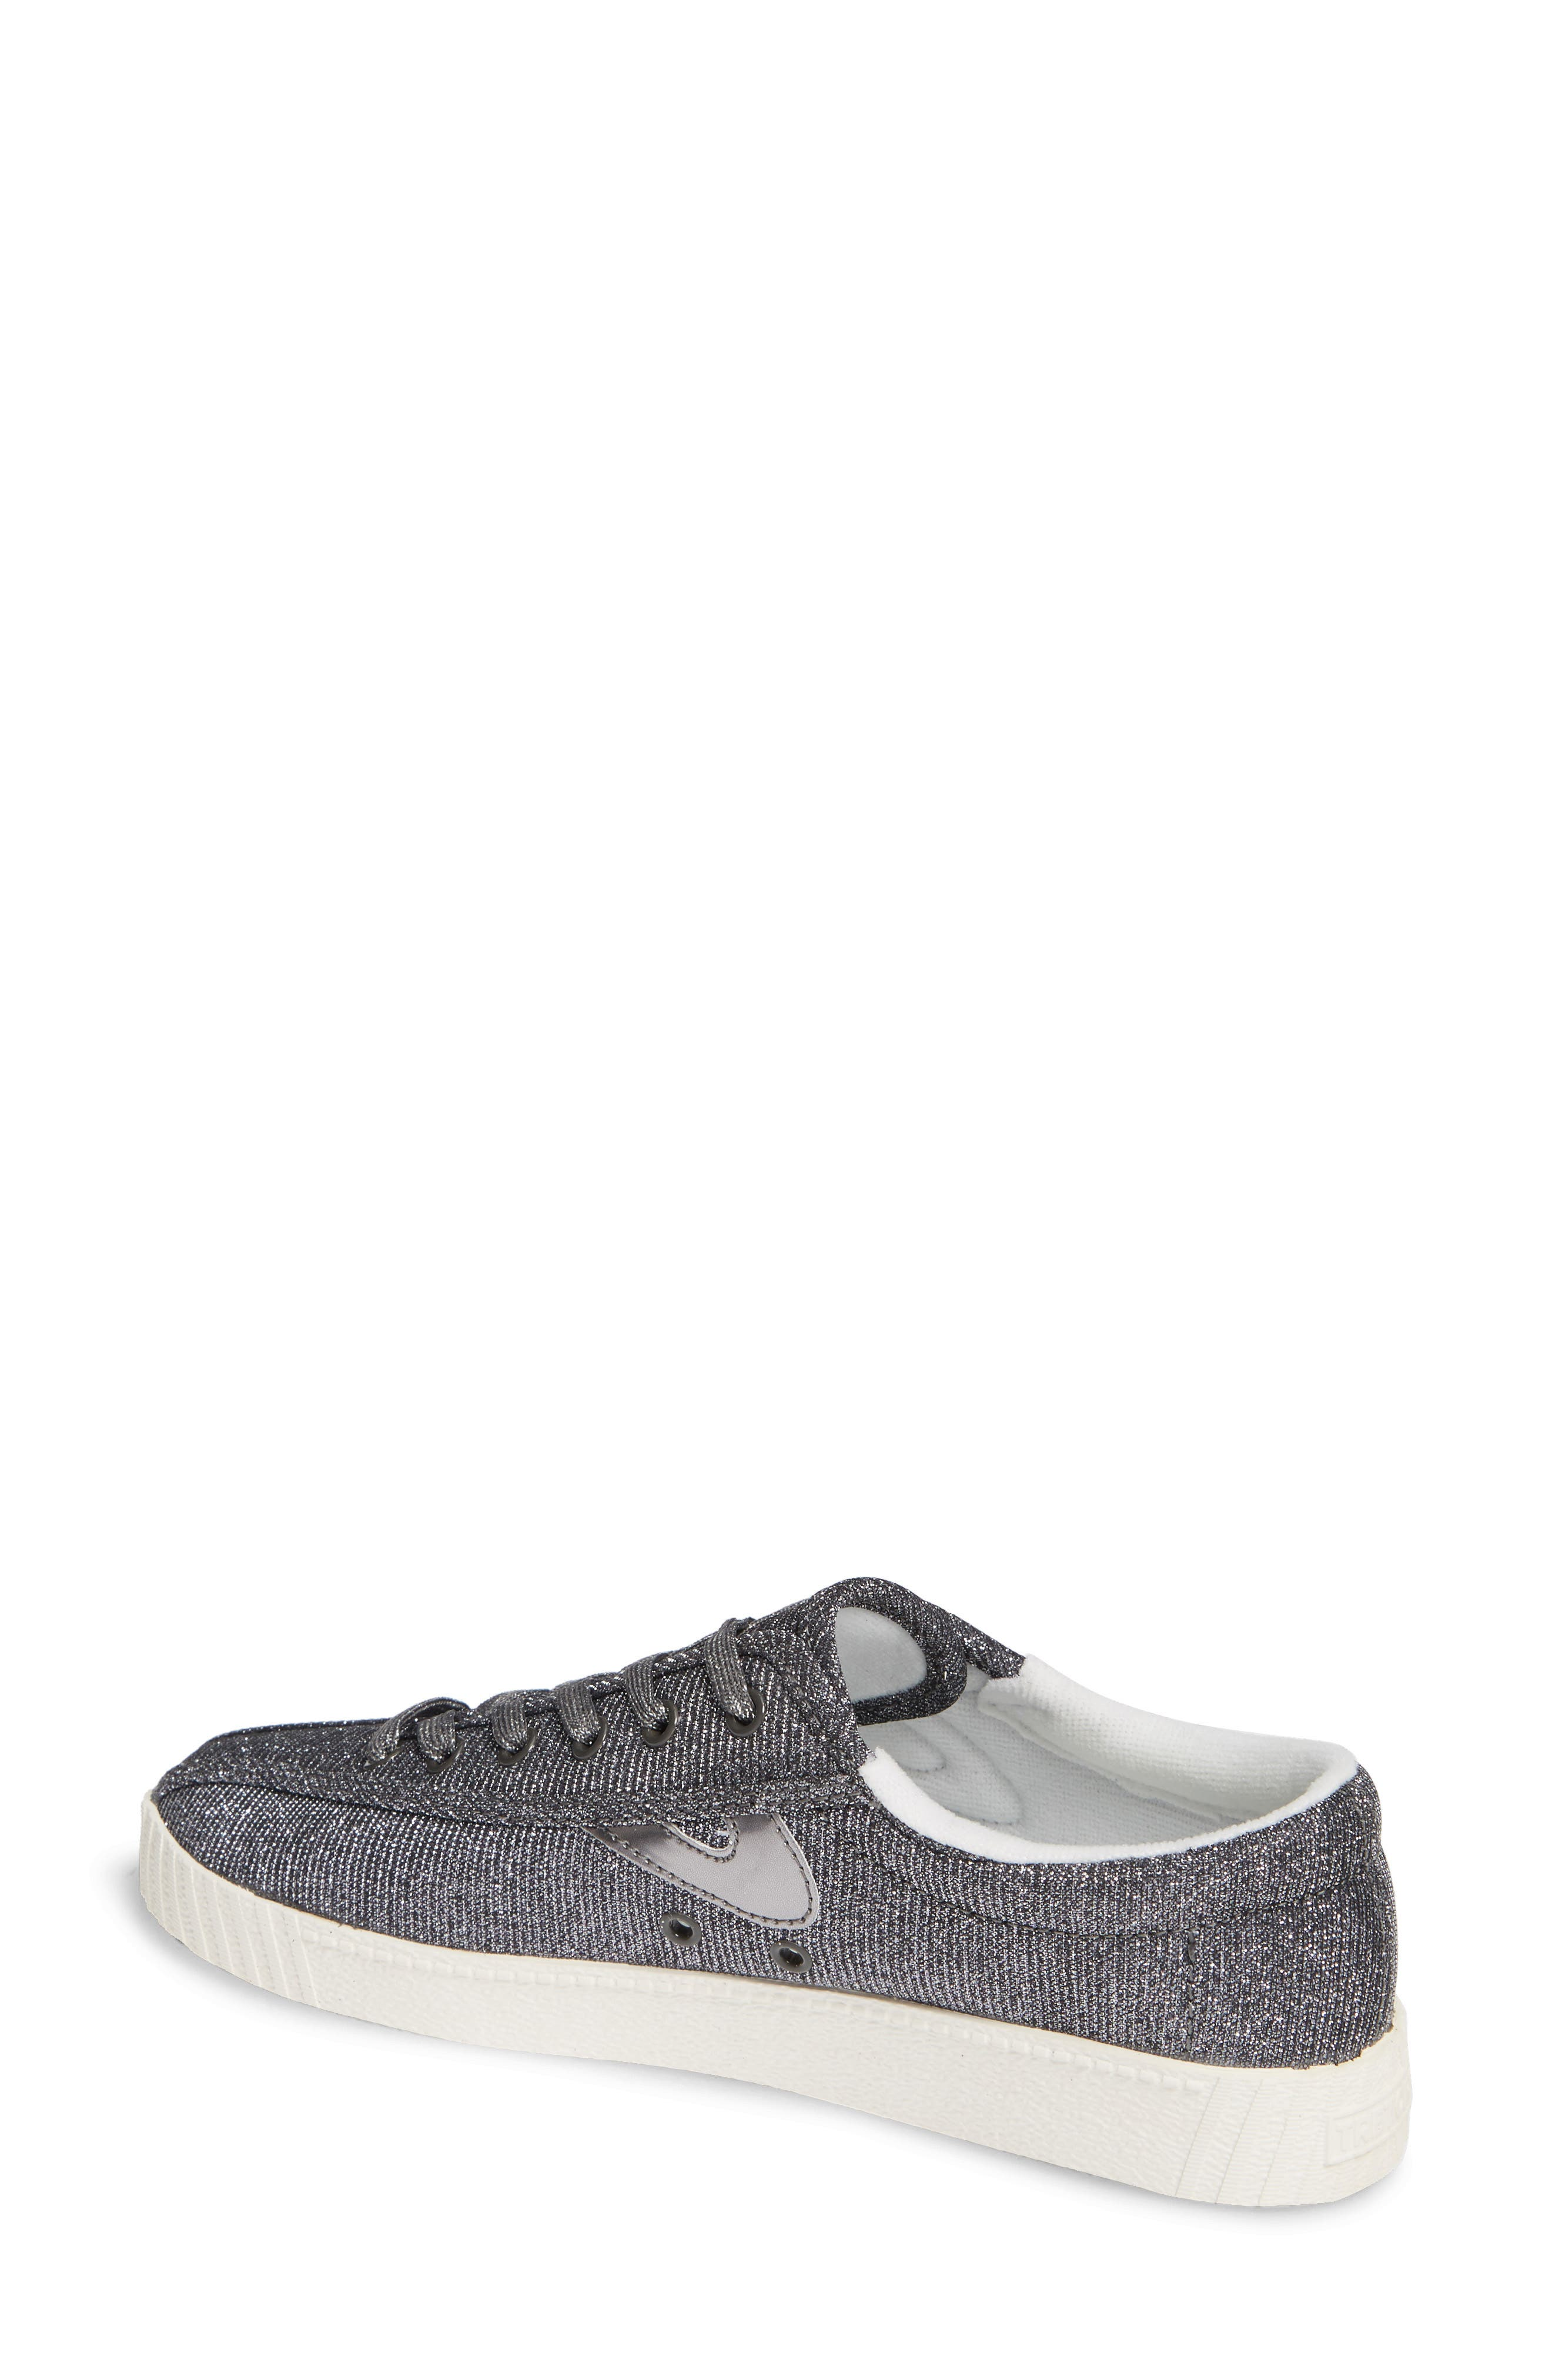 ,                             'Nylite' Sneaker,                             Alternate thumbnail 2, color,                             022